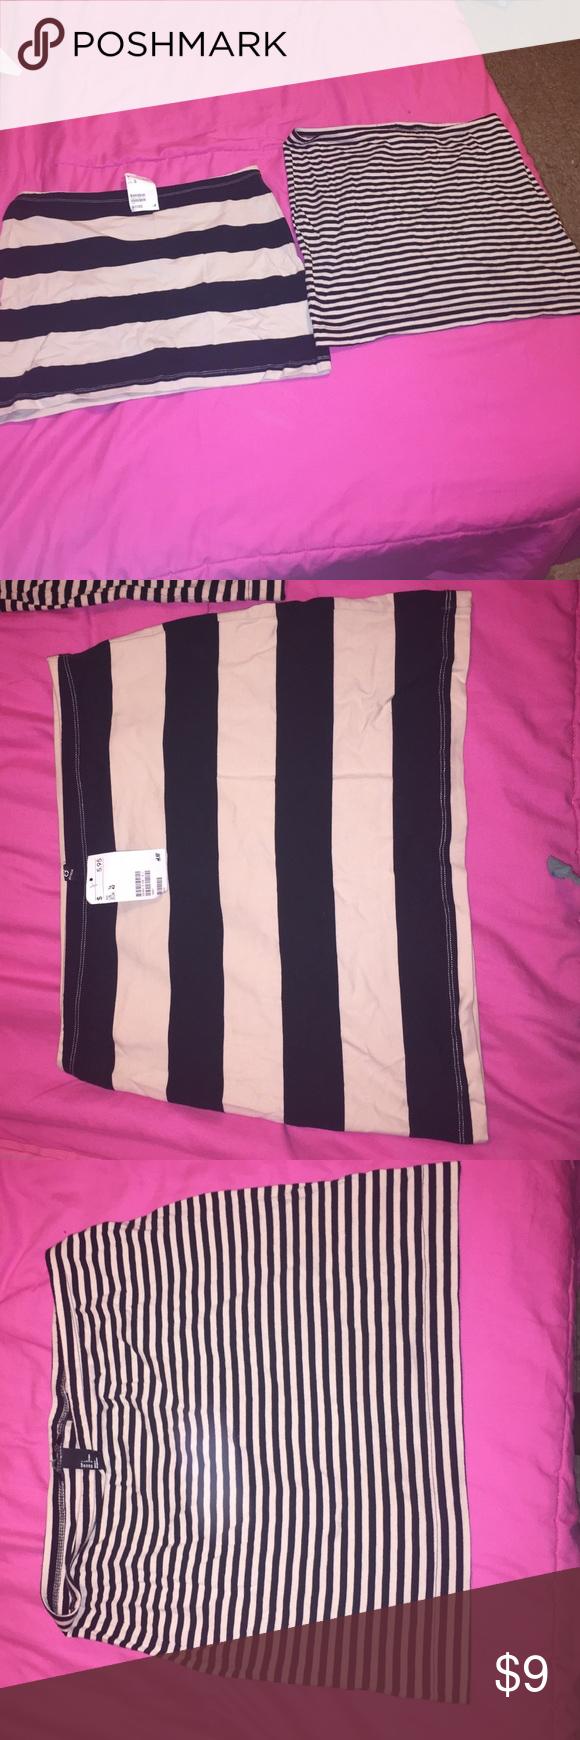 Stripe Mini Skirt Bundle NWT. H&M Stripe black and cream mini skirts. NEVER WORN. One Skirt is a large the other Skirt is a size 12. H&M Skirts Mini